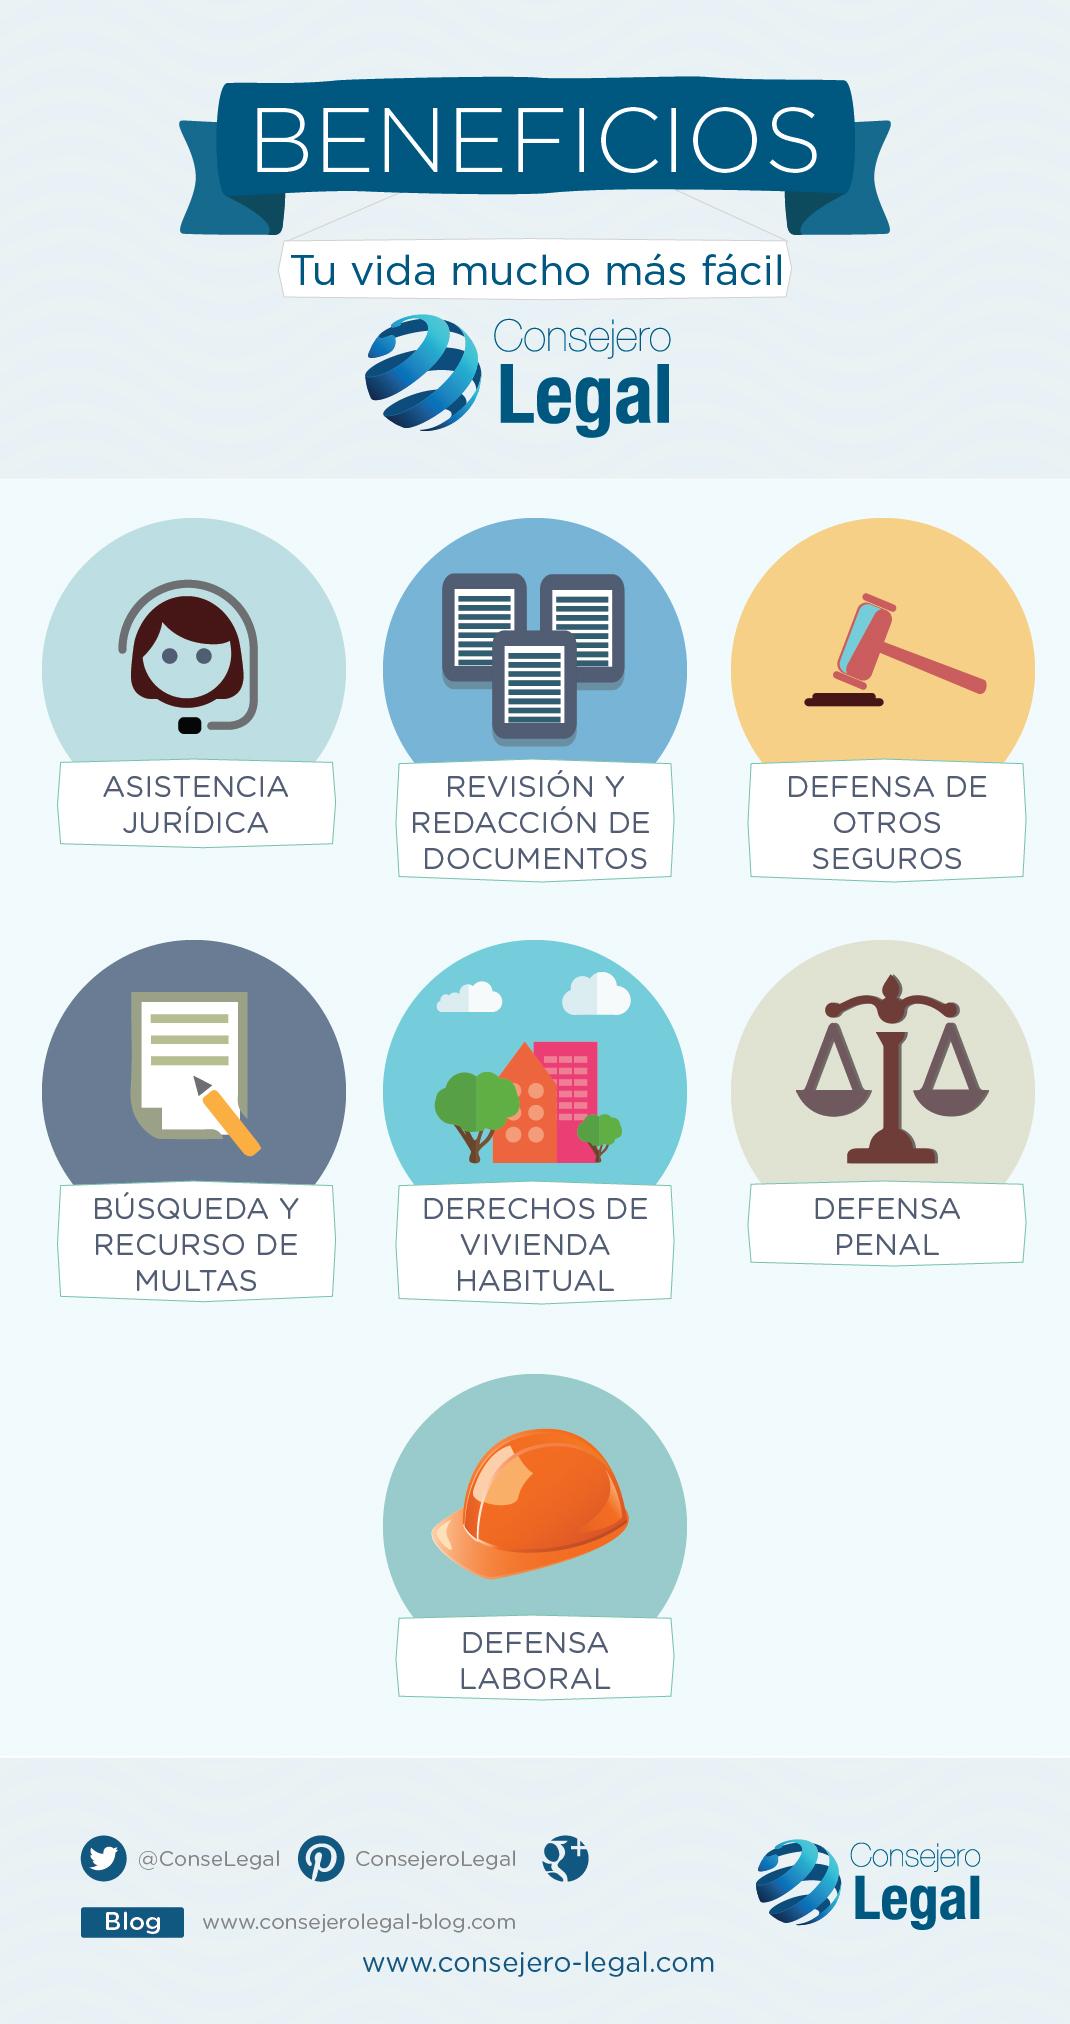 Beneficios de Consejero Legal